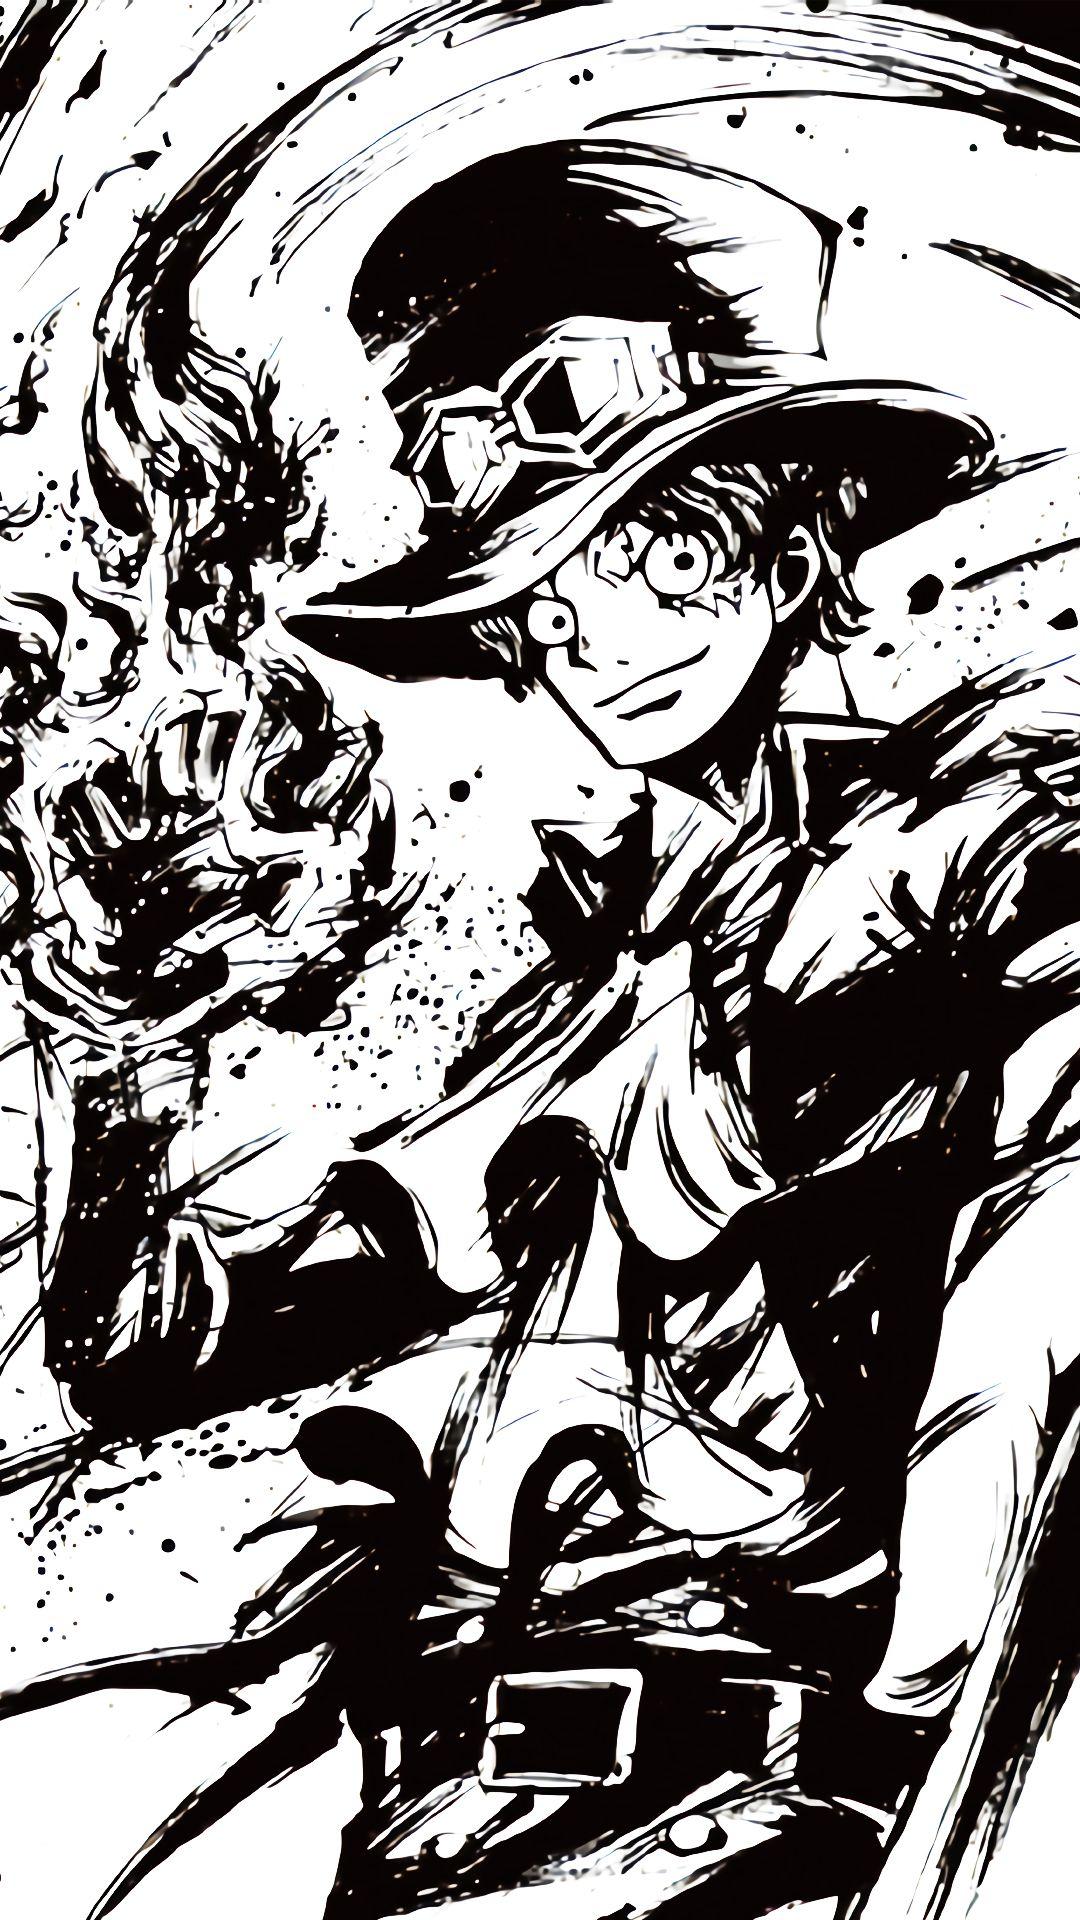 Sabo ワンピース(アニメ), マンガアニメ, アニメのタトゥー, クールな絵